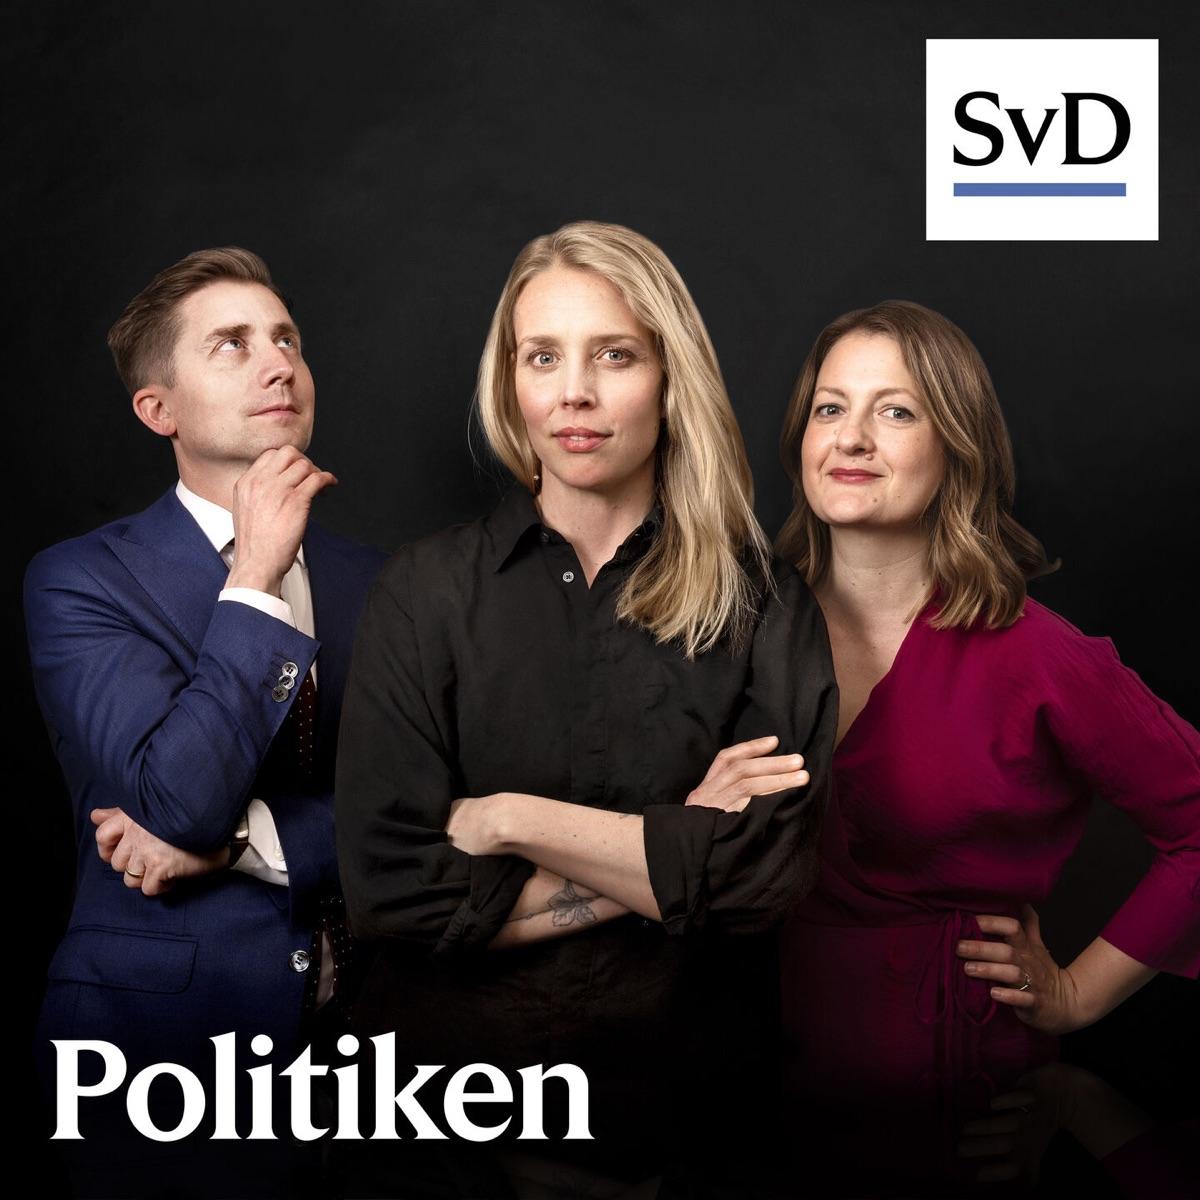 Politiken